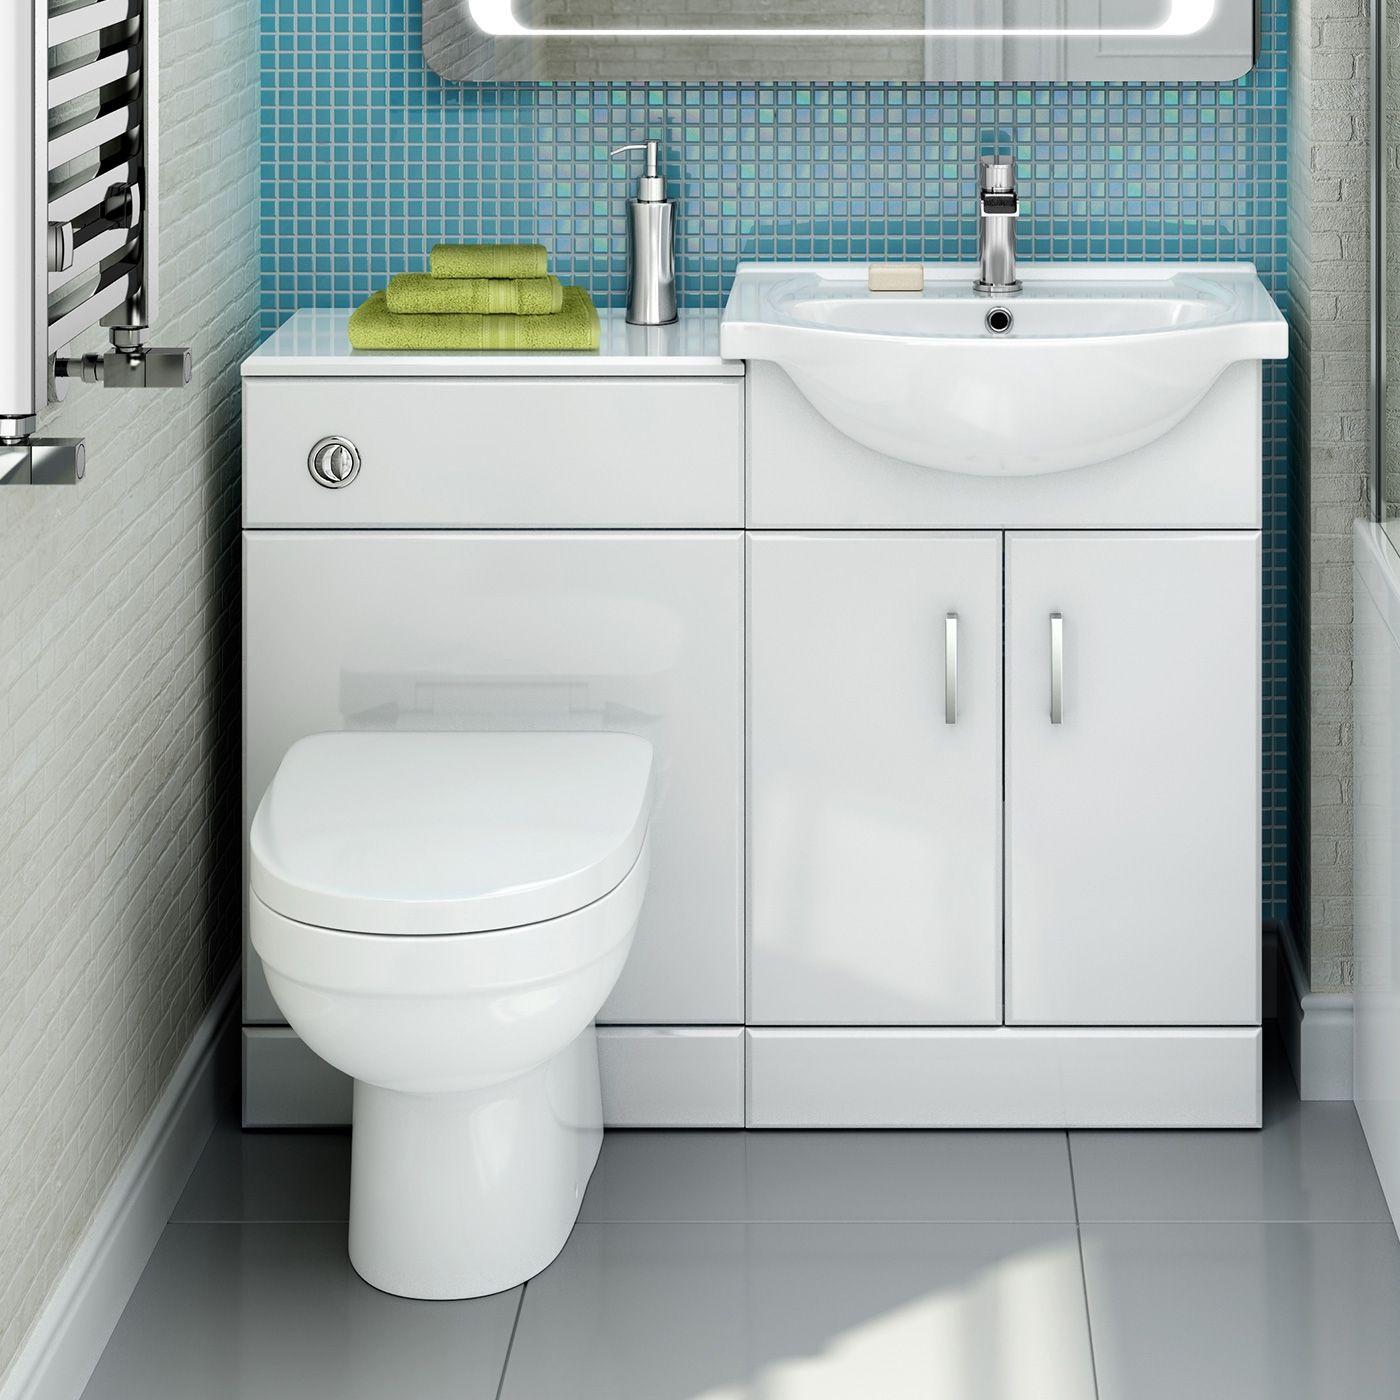 Home Decor Bathroom Medicine Cabinet Ideas Tv Feature Wall regarding size 1400 X 1400